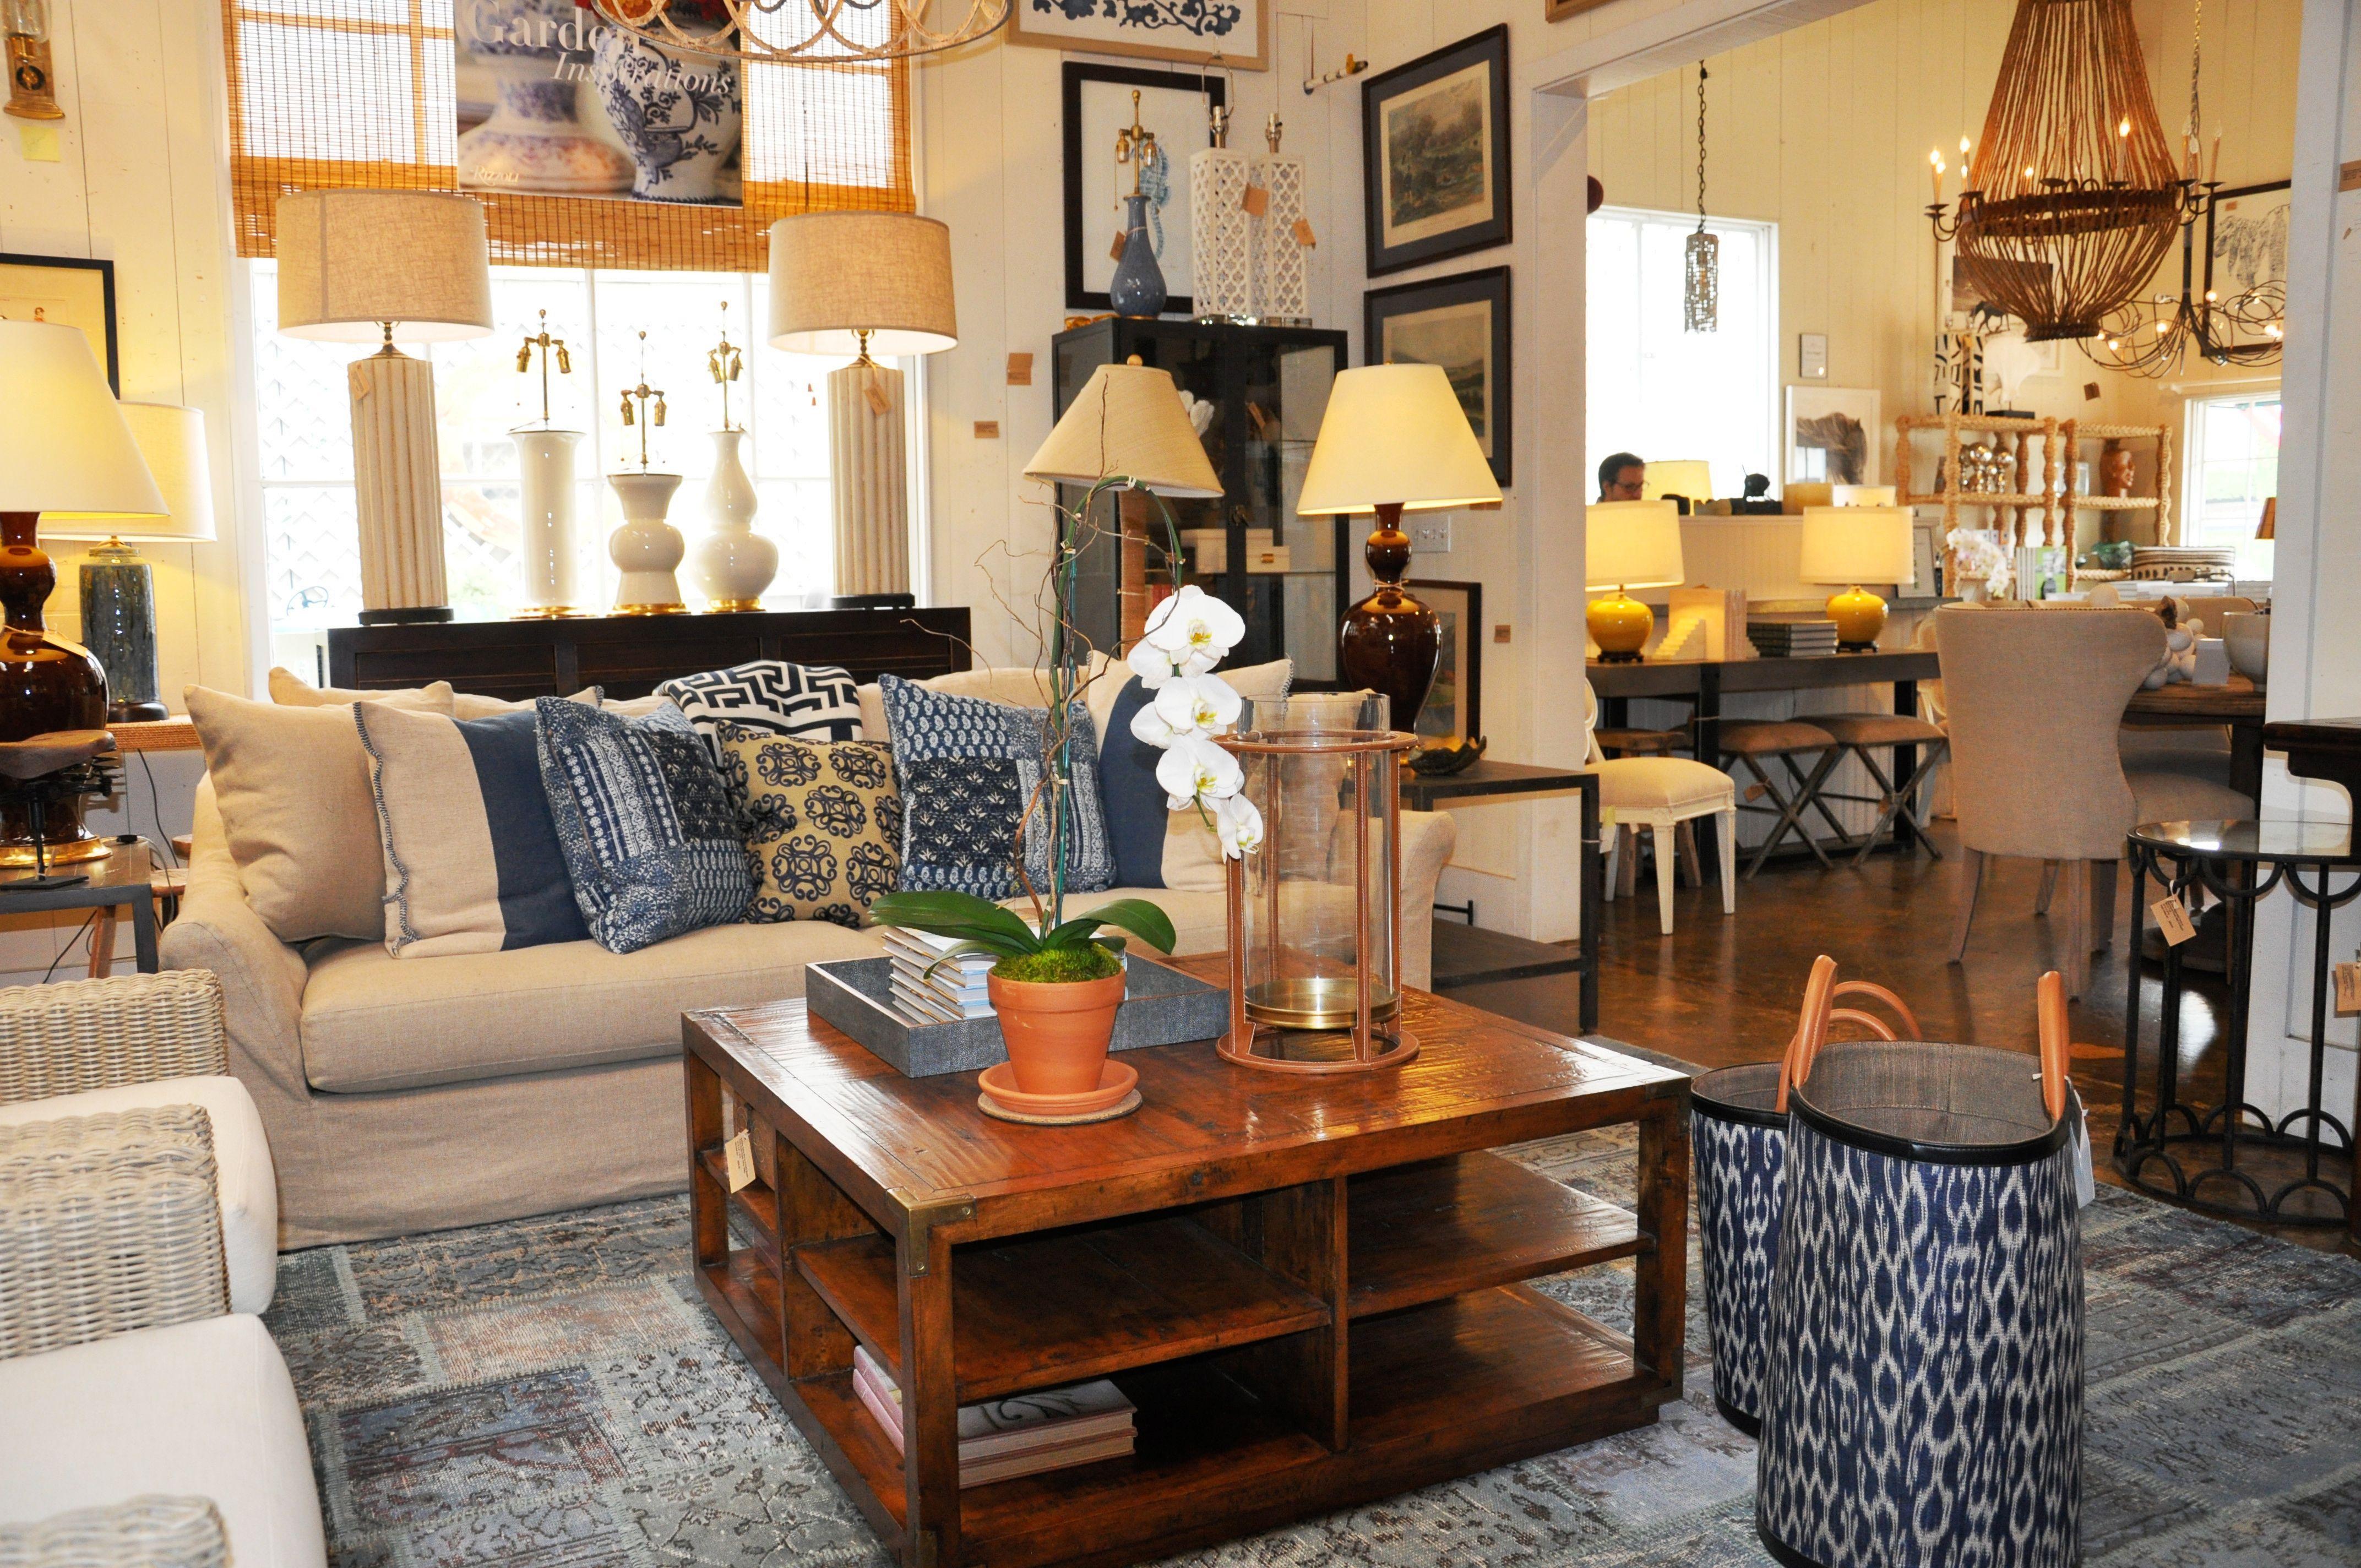 LosAngeles #Mecox #interiordesign #MecoxGardens #furniture #shopping ...